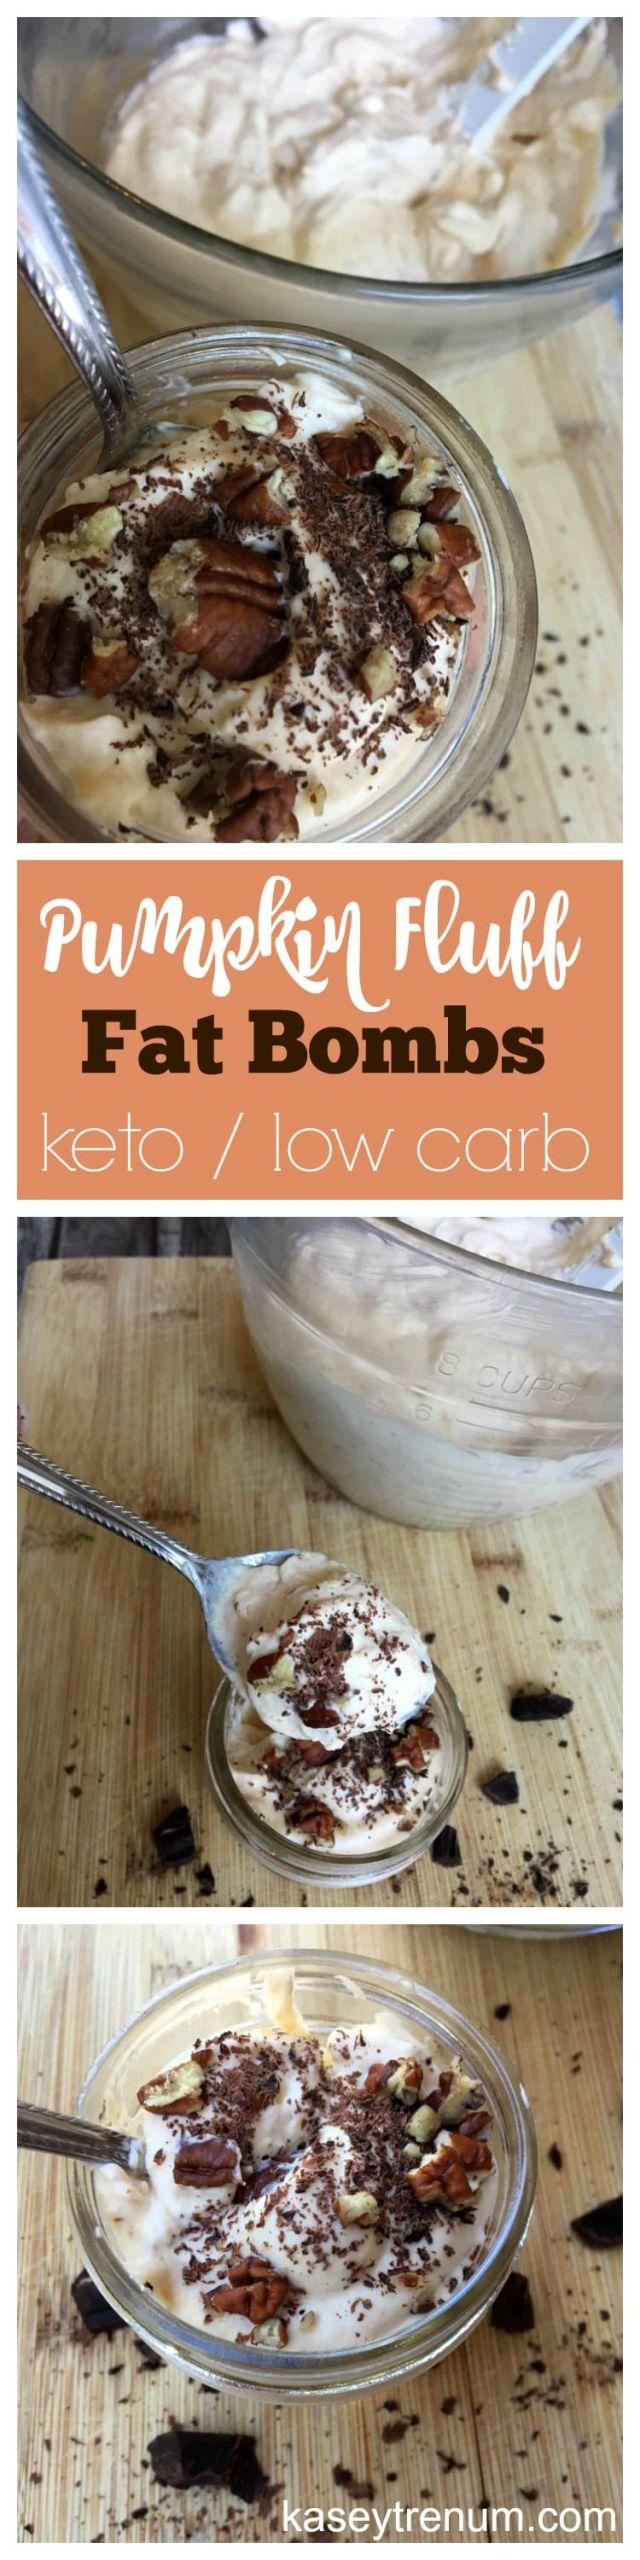 Pumpkin Keto Fat Boms  Keto Pumpkin Fluff Fat Bombs Recipe